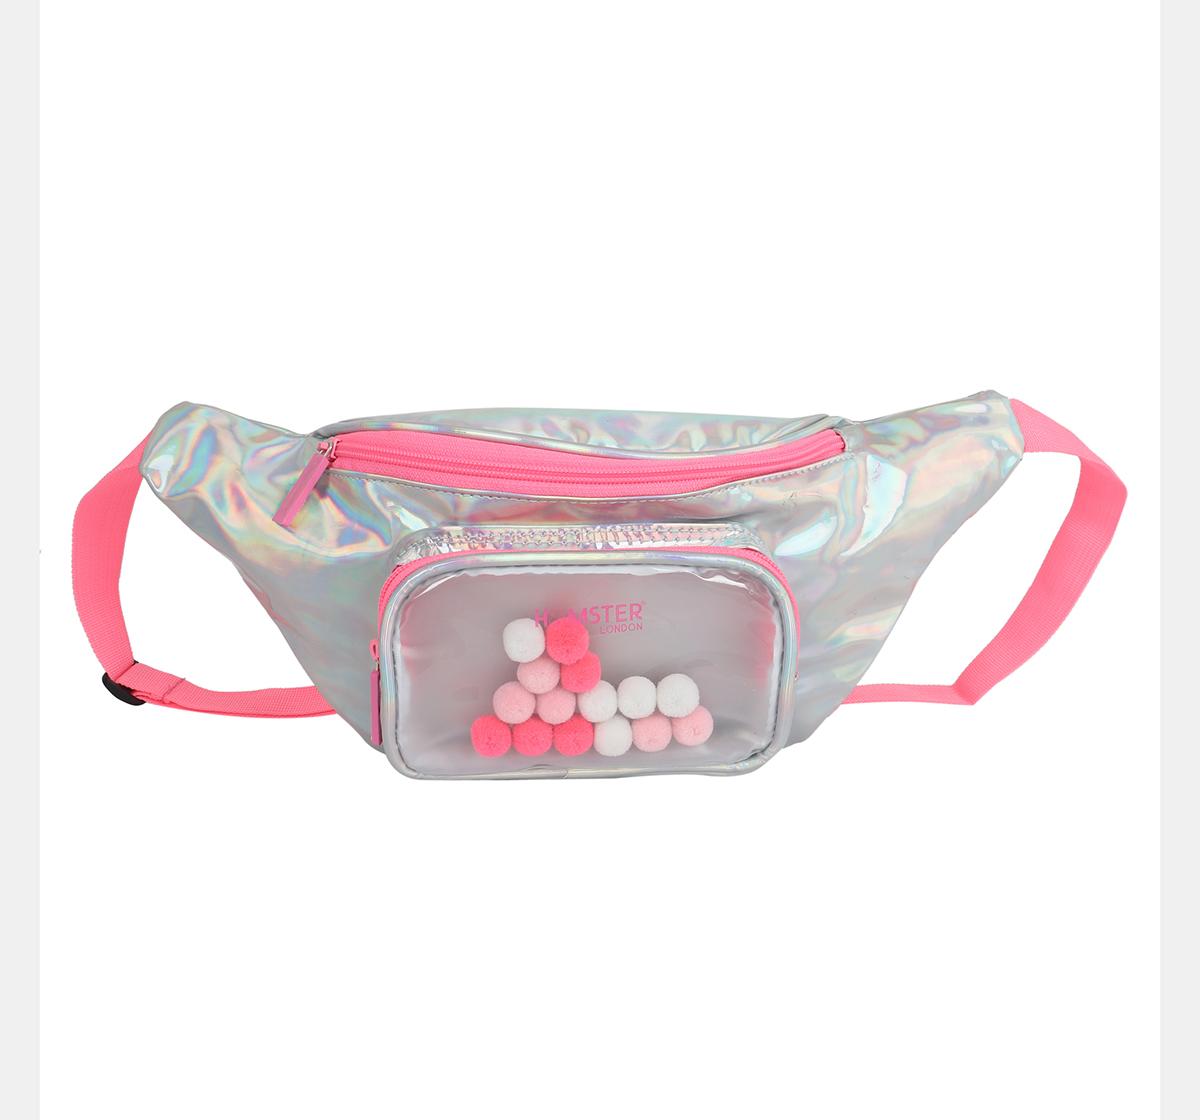 Hamster London   Hamster London Waist Bag Pink, 6Y+